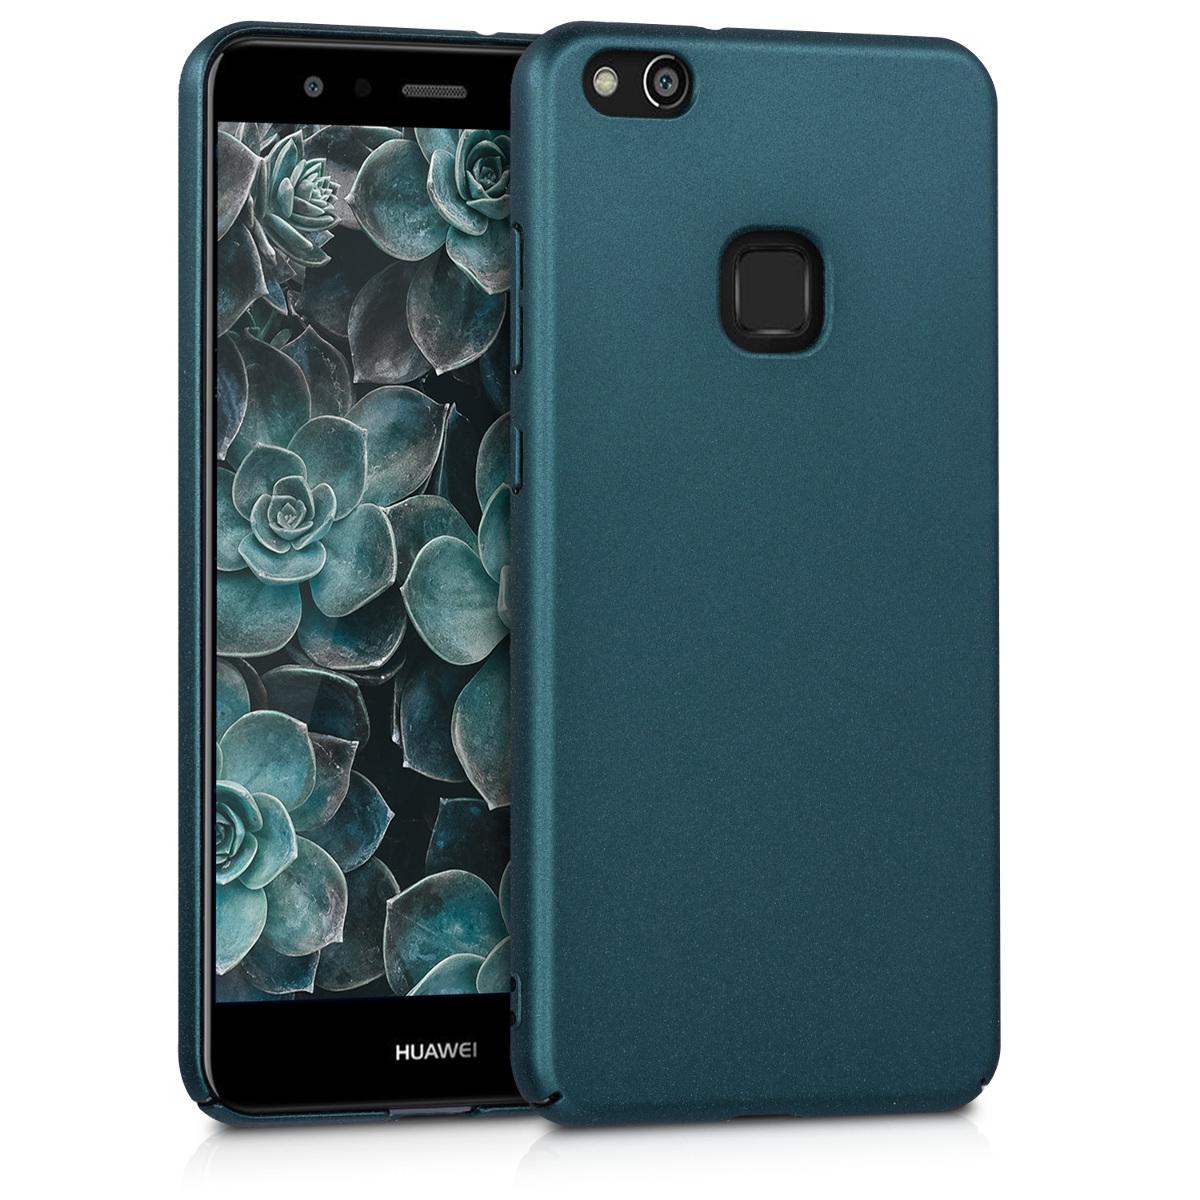 KW Slim Anti-Slip Cover - Σκληρή Θήκη Καουτσούκ Huawei P10 Lite - Τυρκουαζ μεταλλικό (43596.78)